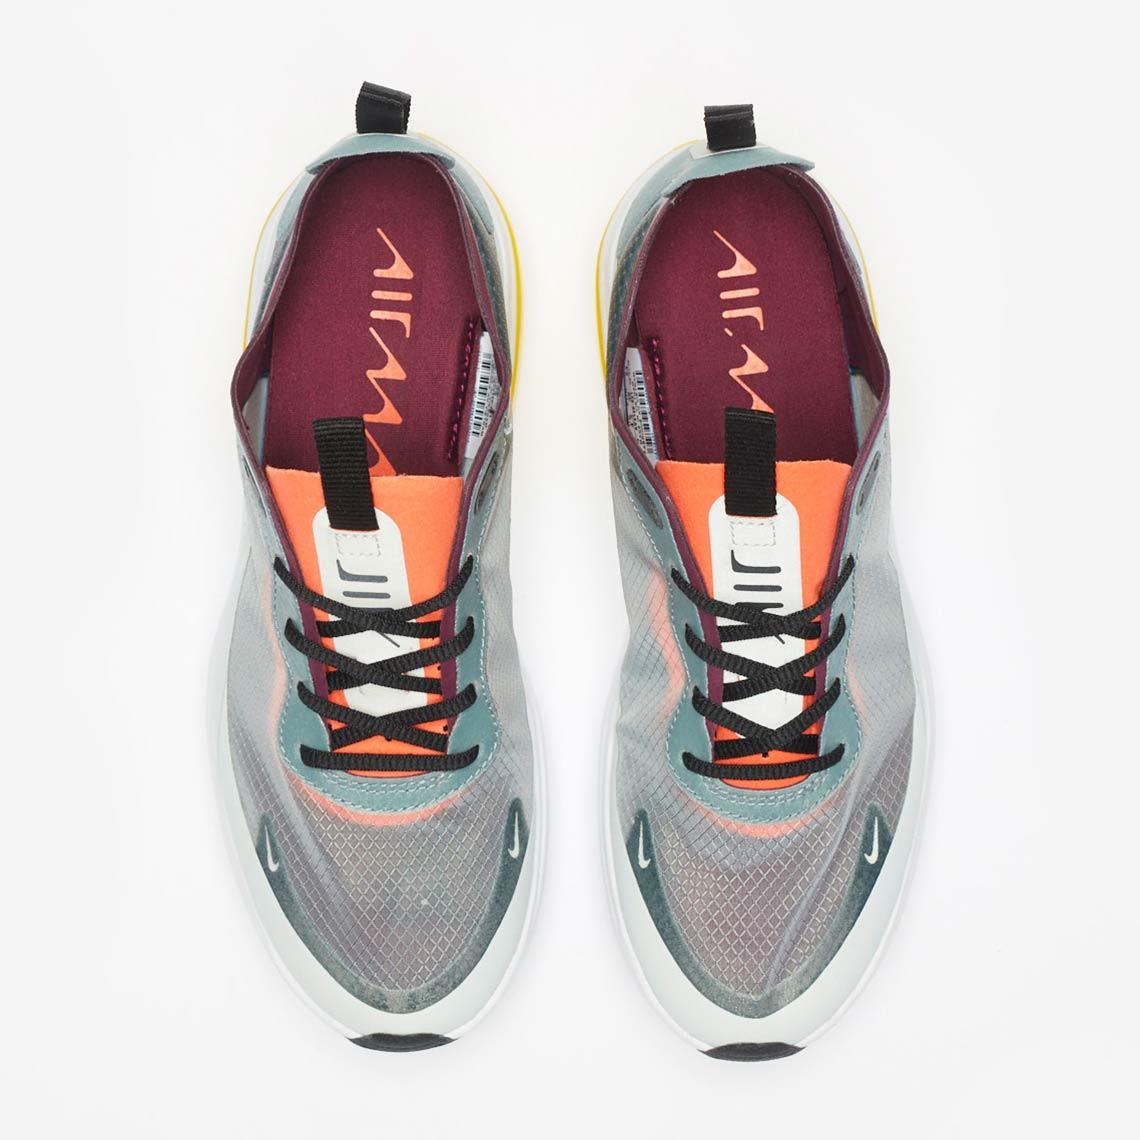 Max Dia 001 Date Air Av4146 Womens Nike Release RLjA4q35